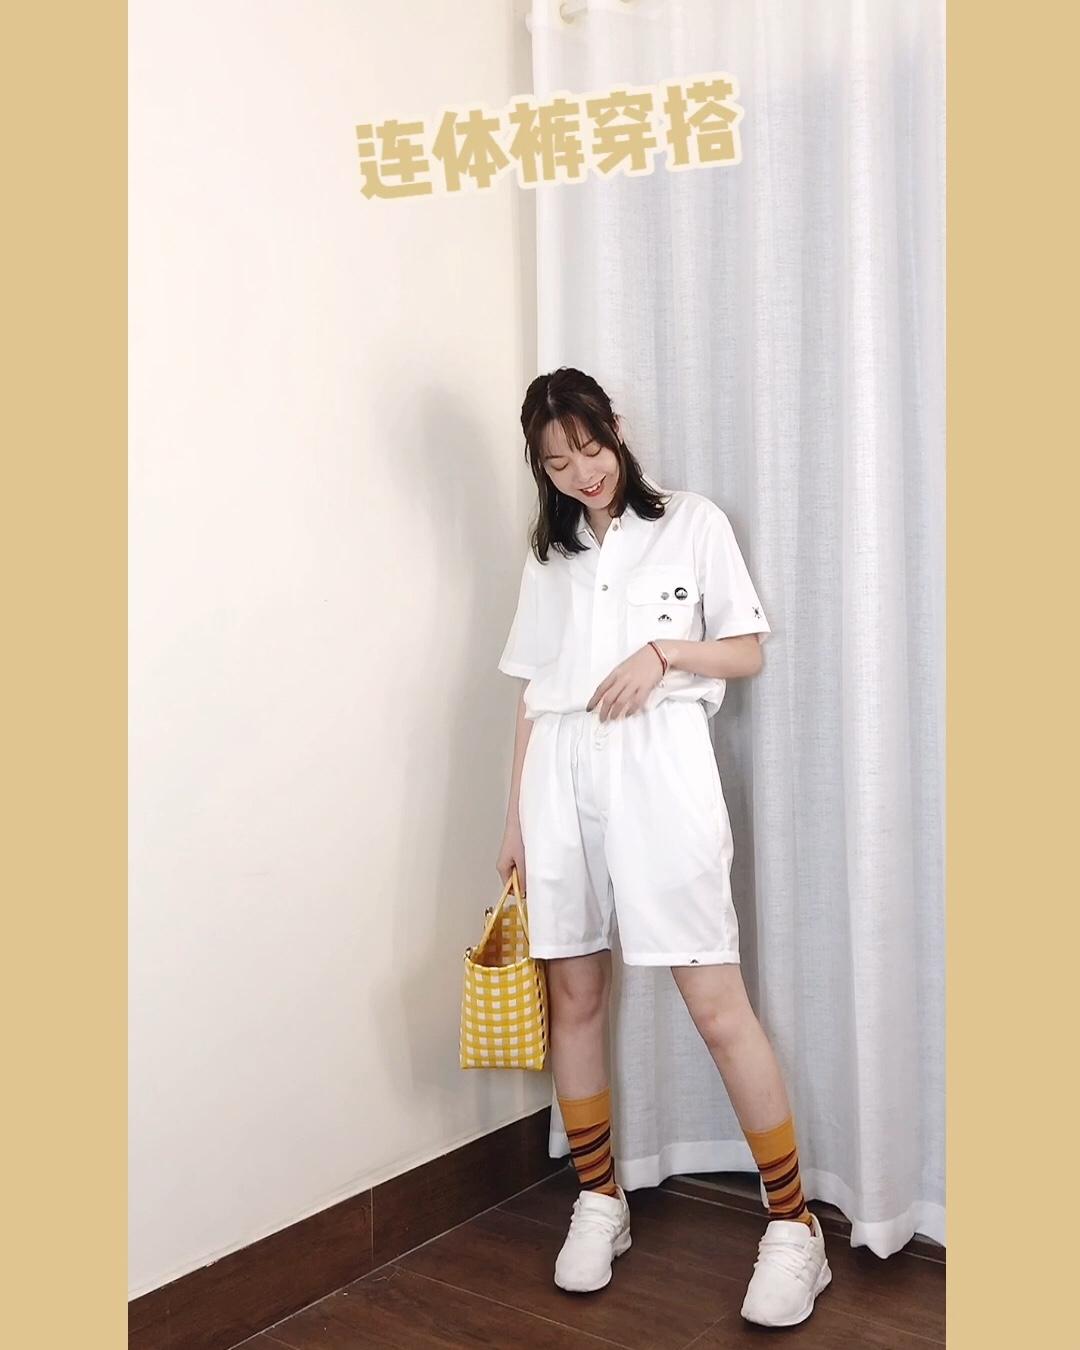 CC穿搭  连体裤:URBAN FOREST 鞋子:adidas Originals 包包:Marni #120斤到90斤!微胖mm购物车公开# 纯白色的连体裤,腰部带有收腰带,可以将腰线收紧,搭配黄色的袋子和袜子,十分减龄,也是很适合夏日的颜色